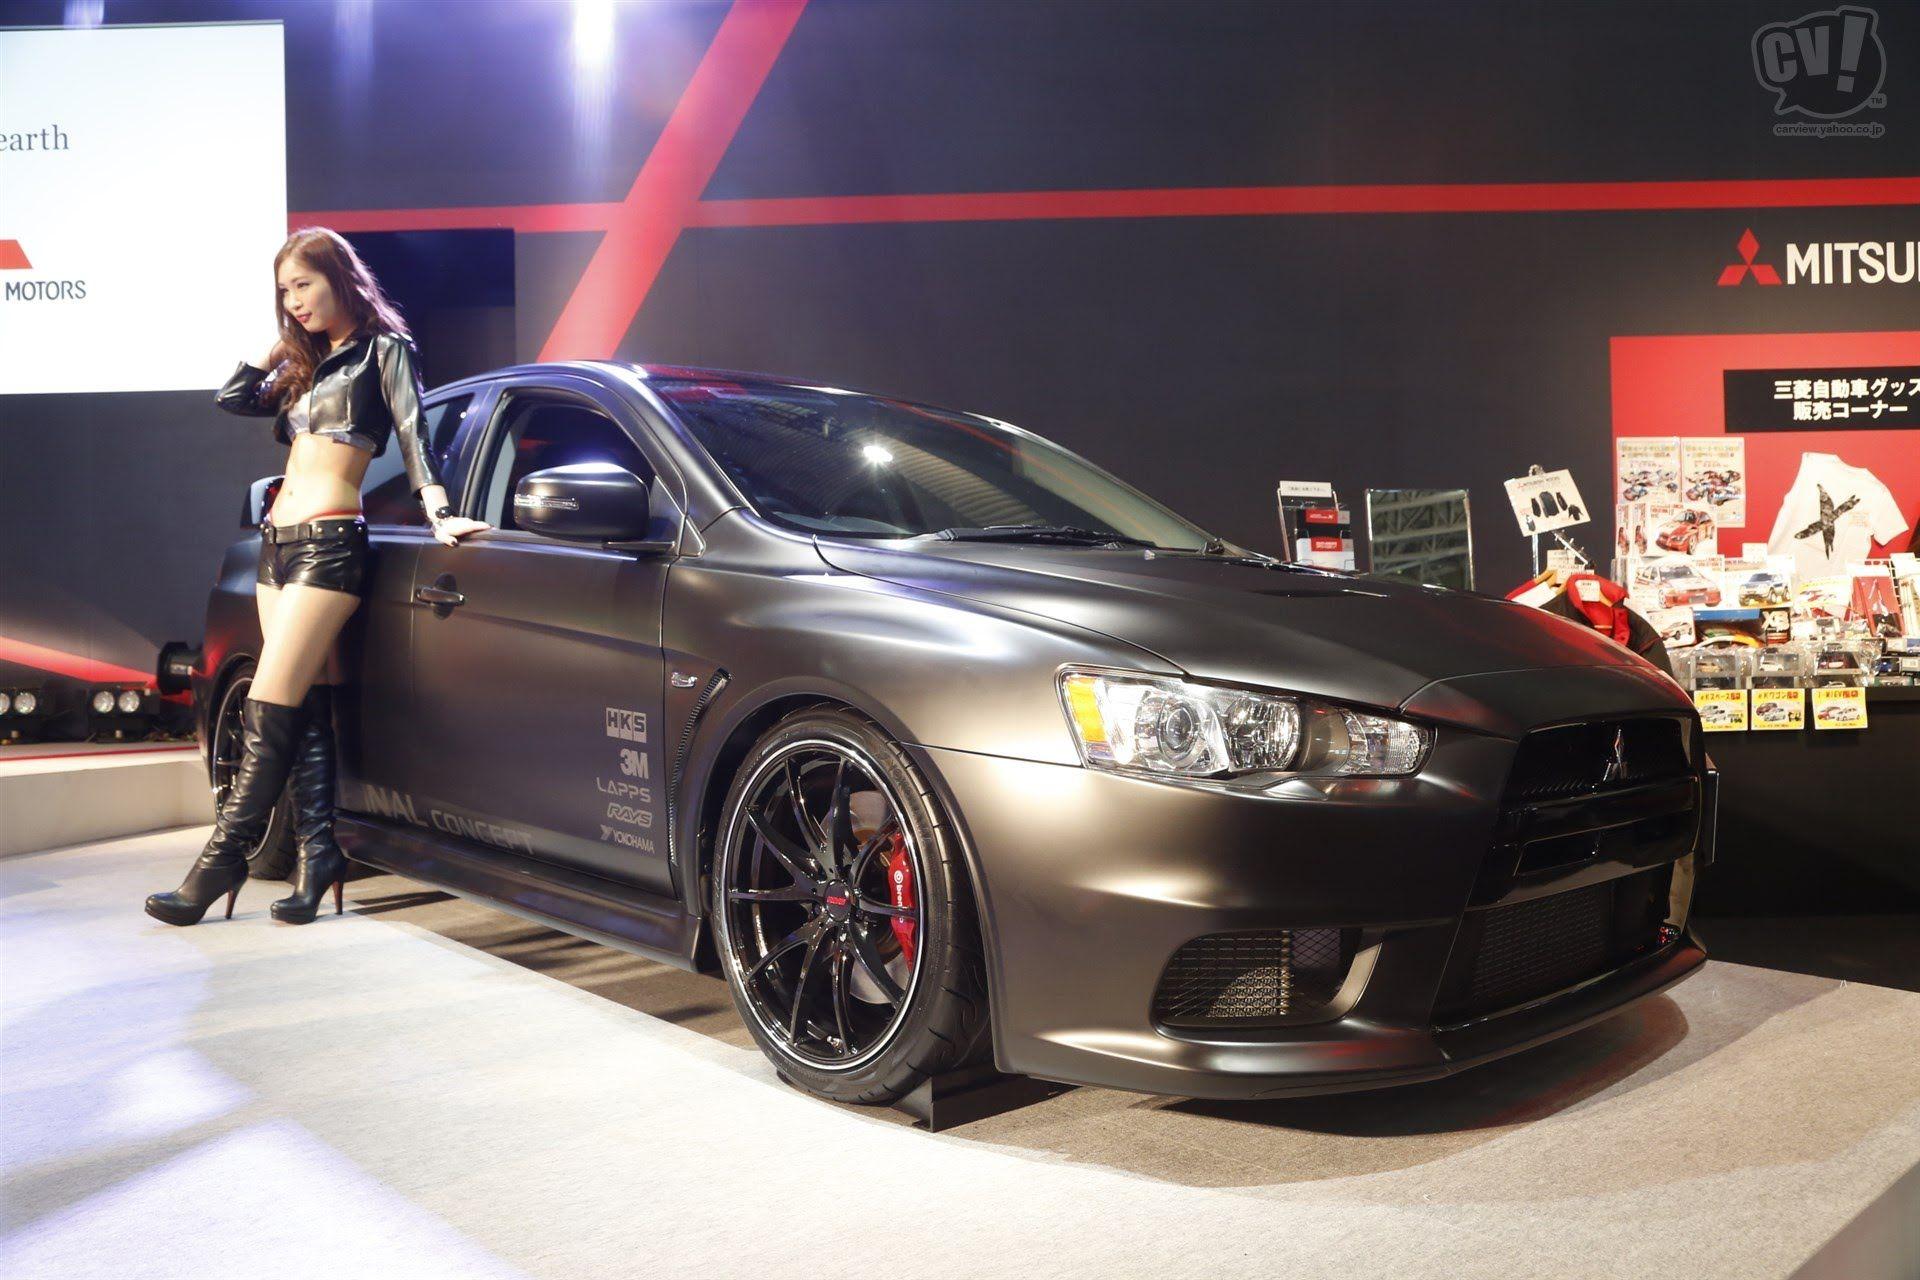 mitsubishi evo 2015 interior. mitsubishi lancer evolution x final concept tokyo auto salon 2015 evo interior